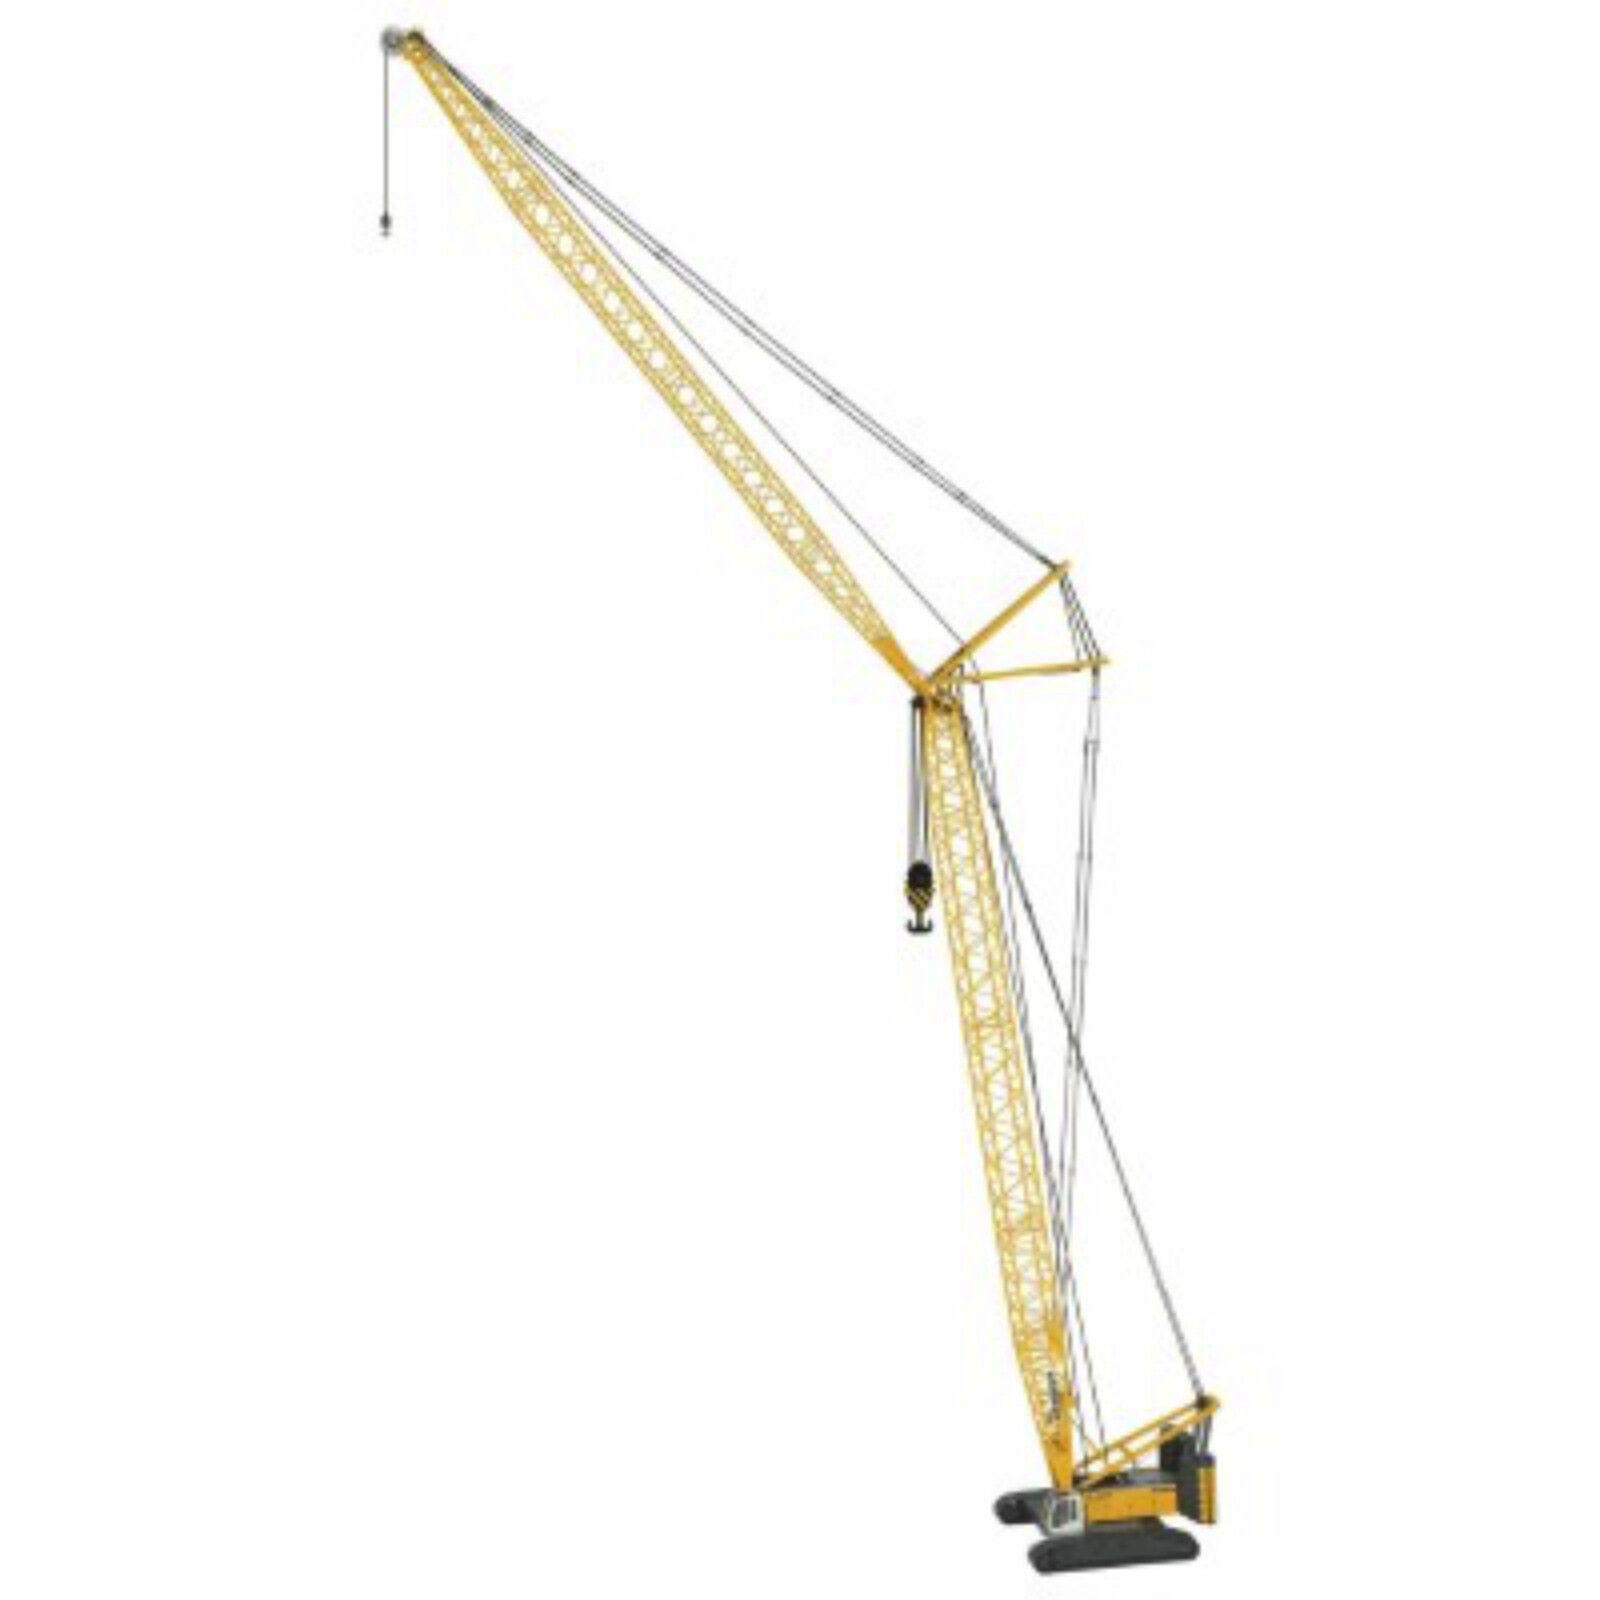 NZG Liebherr LR1300 Crawler Crane NEW OVP